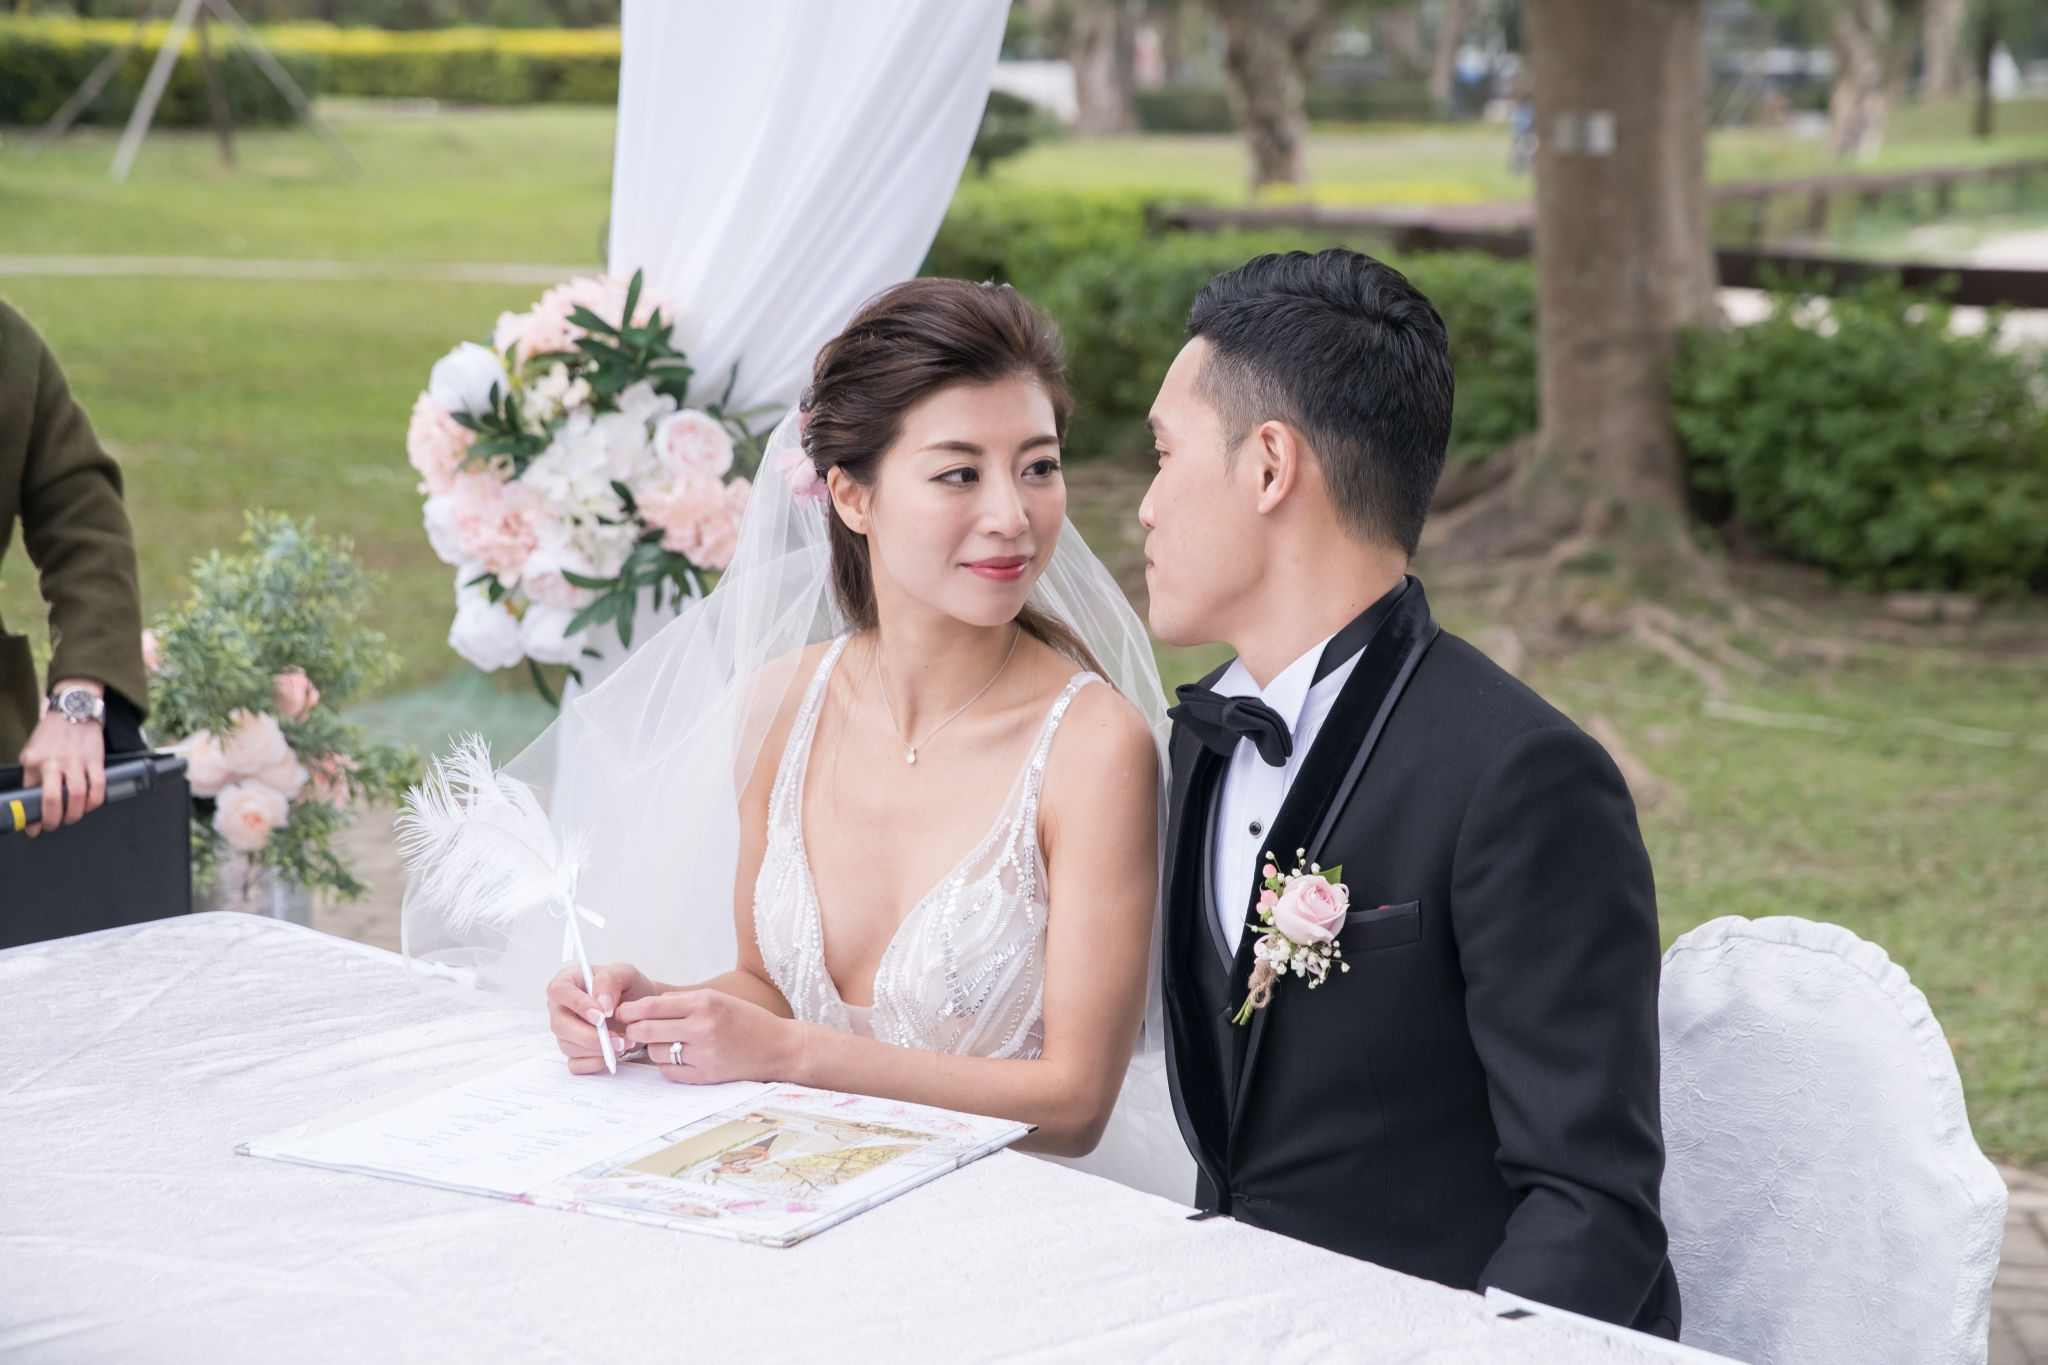 Wedding Registration - 結婚註冊拍攝作品